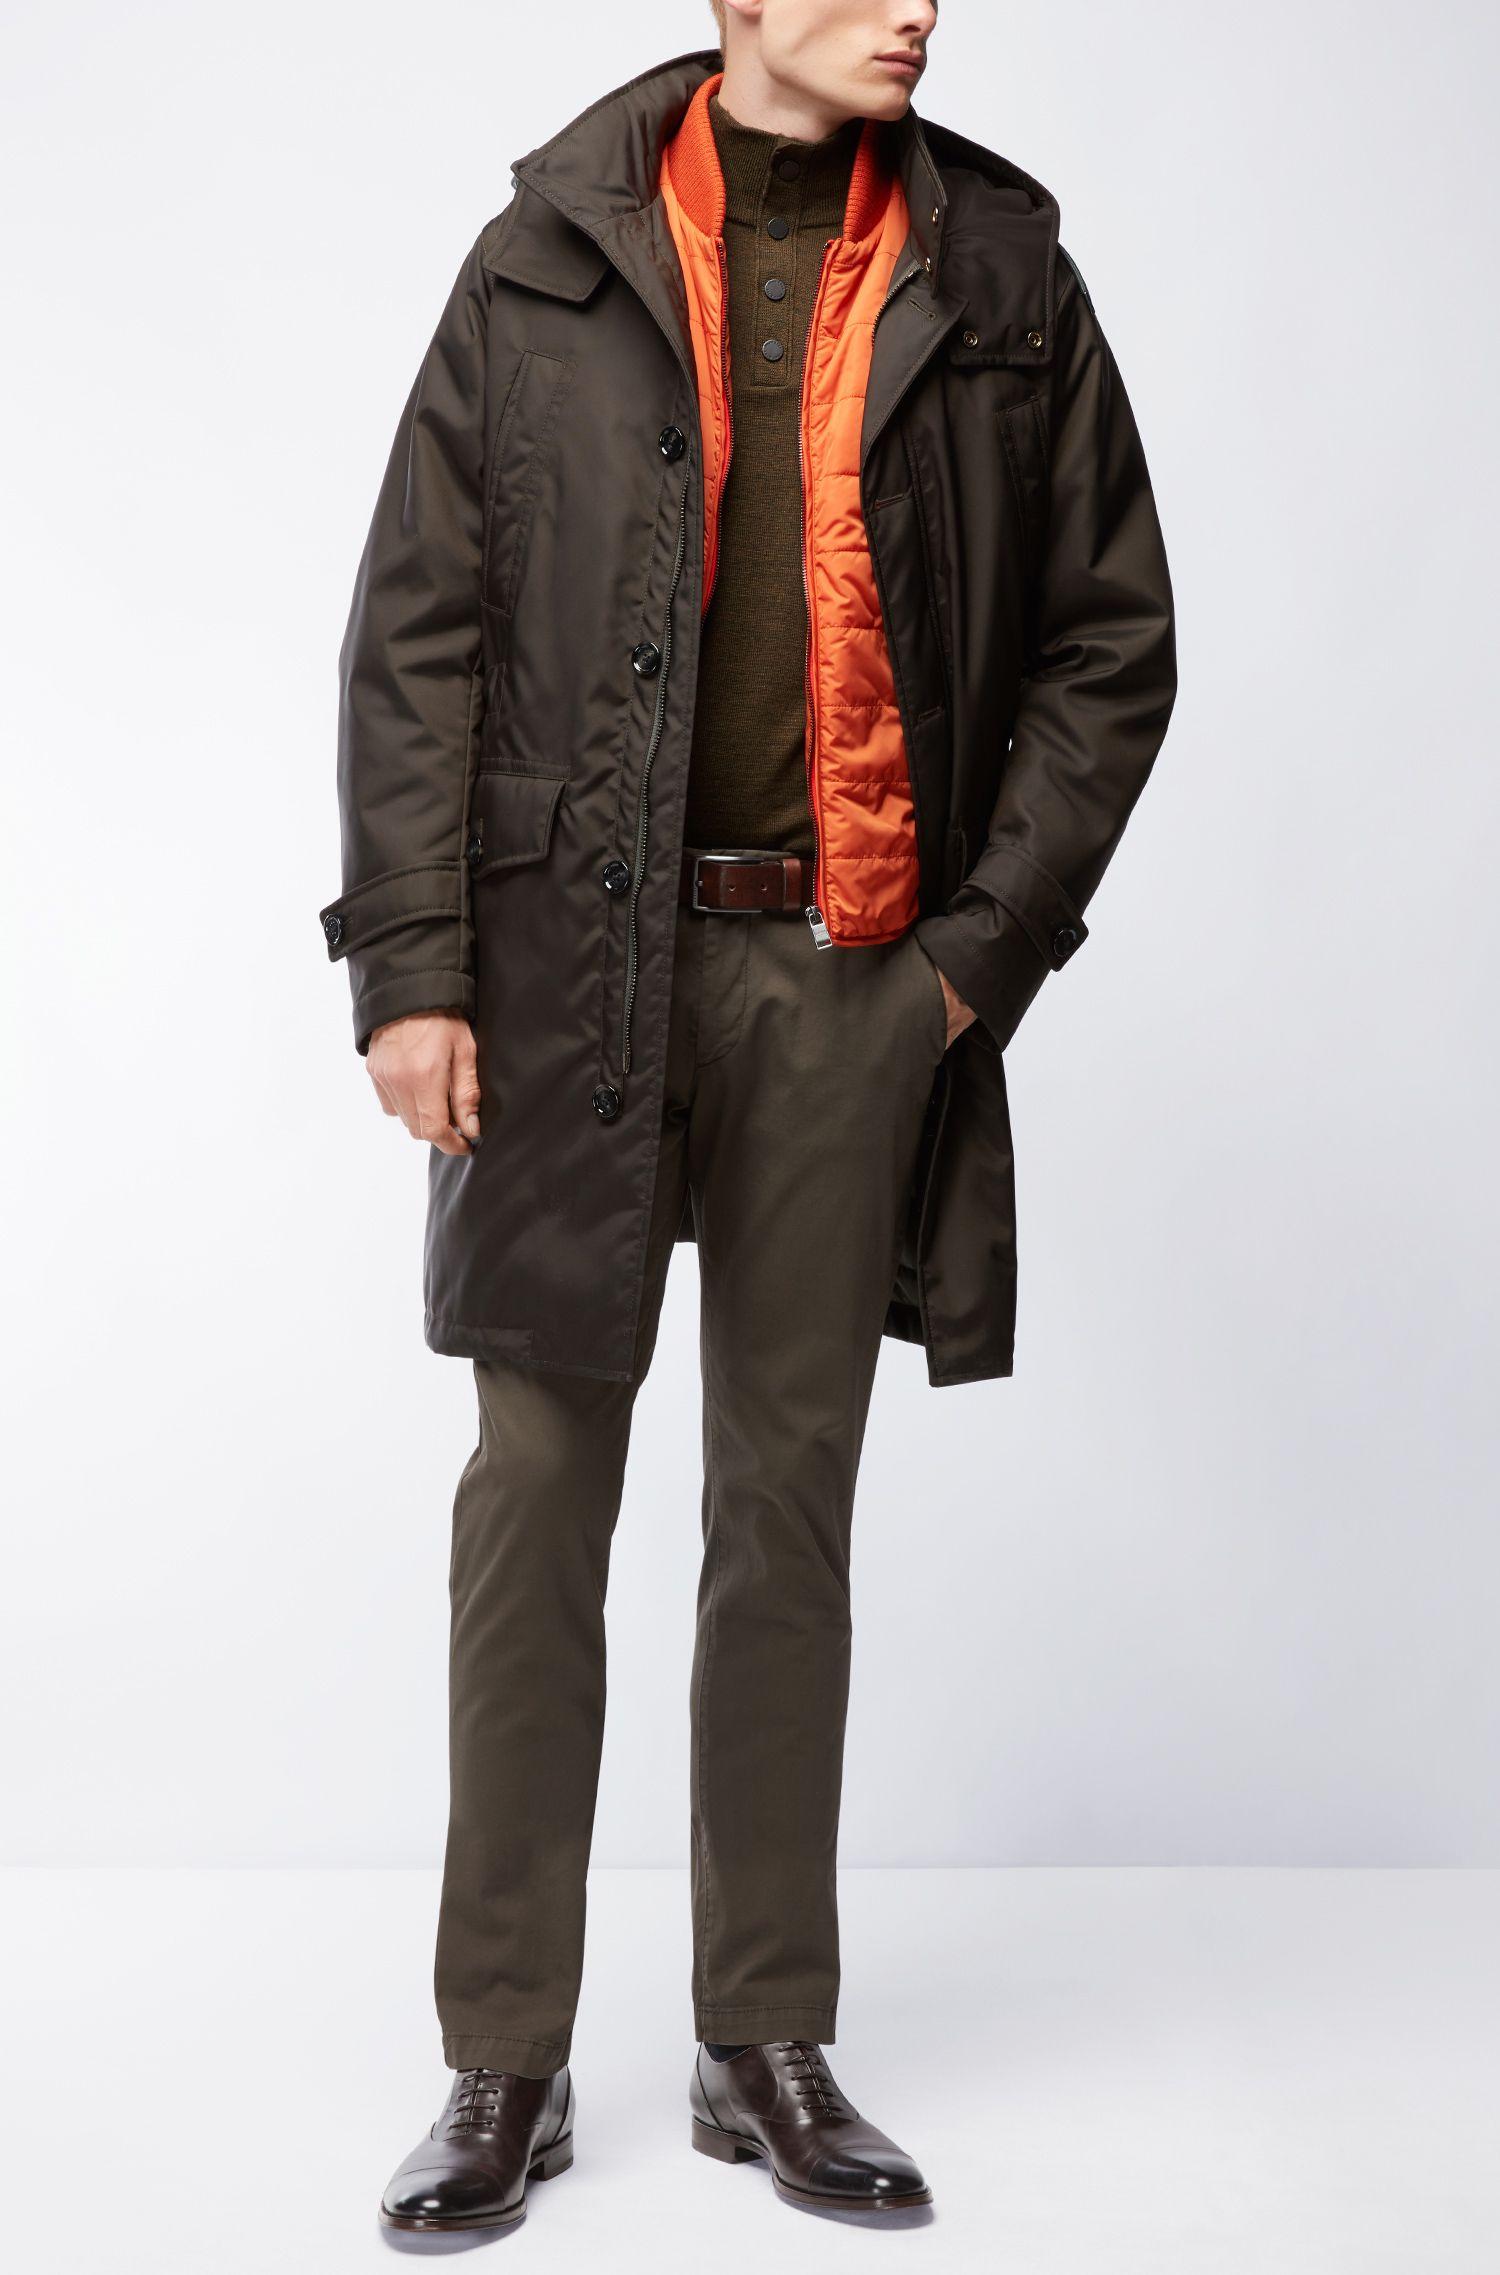 Extra-Fine Merino Wool Sweater | Novellino